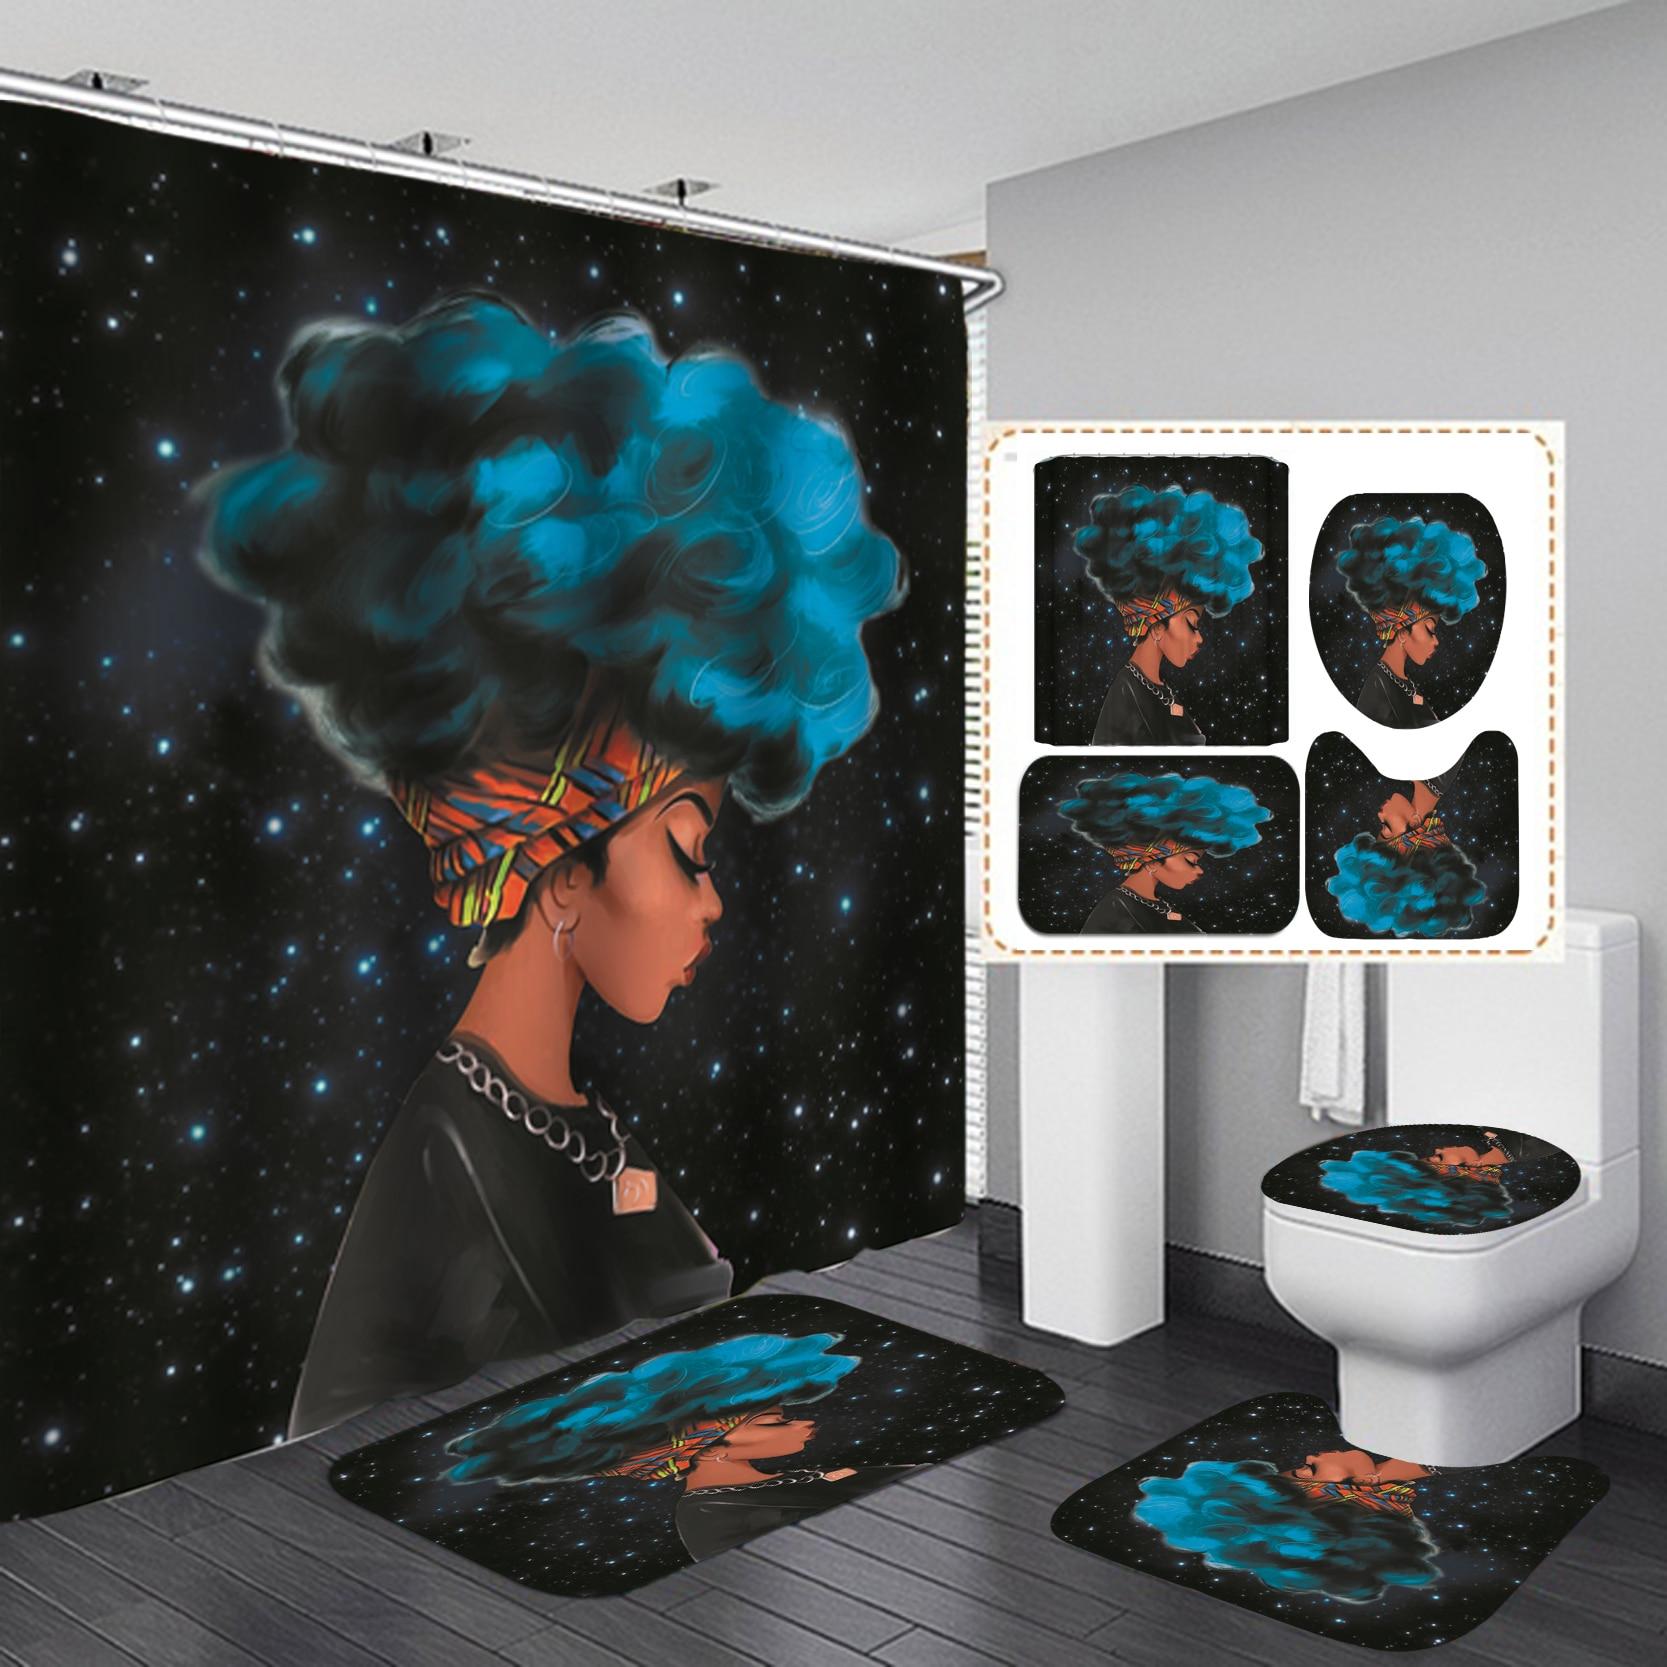 Cielo estrellado cielo niña negra africana Cortina de ducha Afro pelo azul mujer americana cortinas de baño antideslizantes alfombras tapa de inodoro cubierta estera